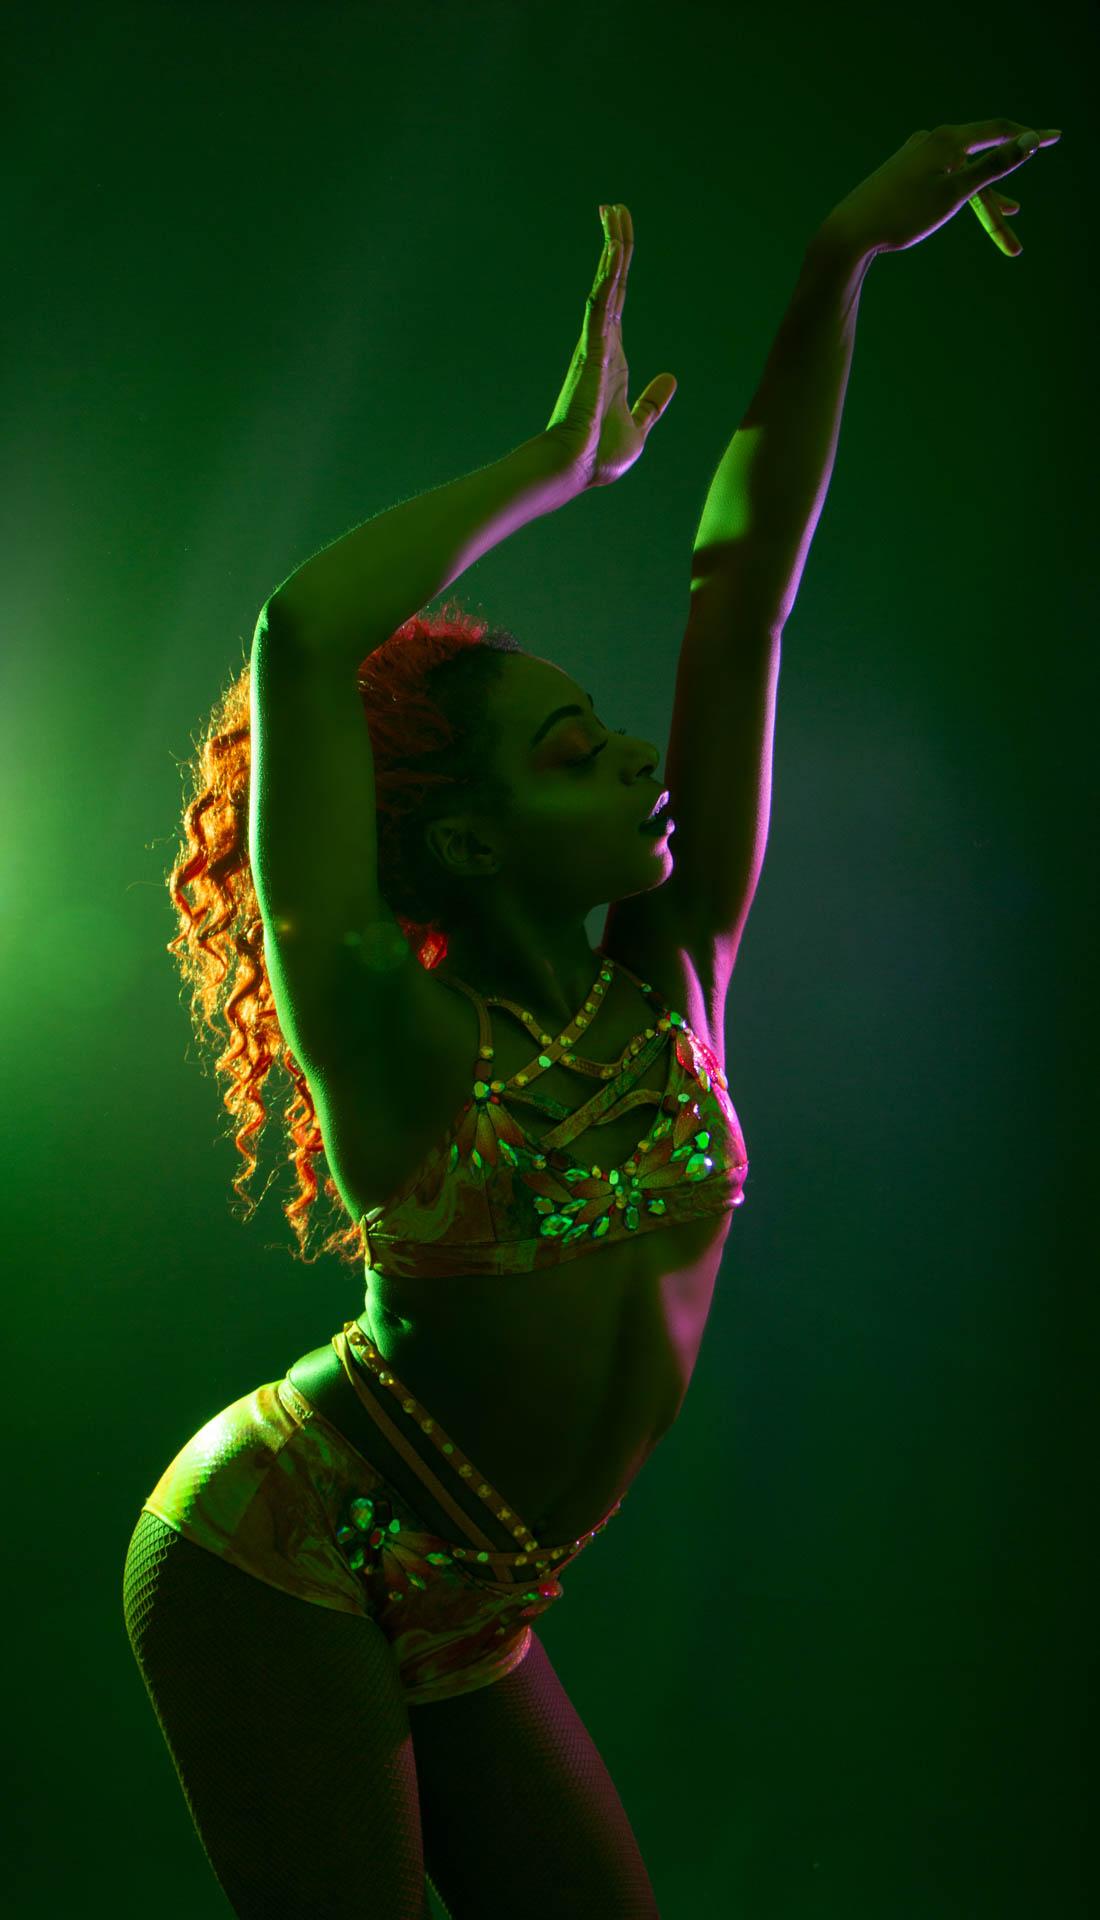 Studio dance portfolio, circus performer portfolio, dance photography uk, dance photoshoot birmingham, dance photographer Birmingham West Midlands Staffordshire